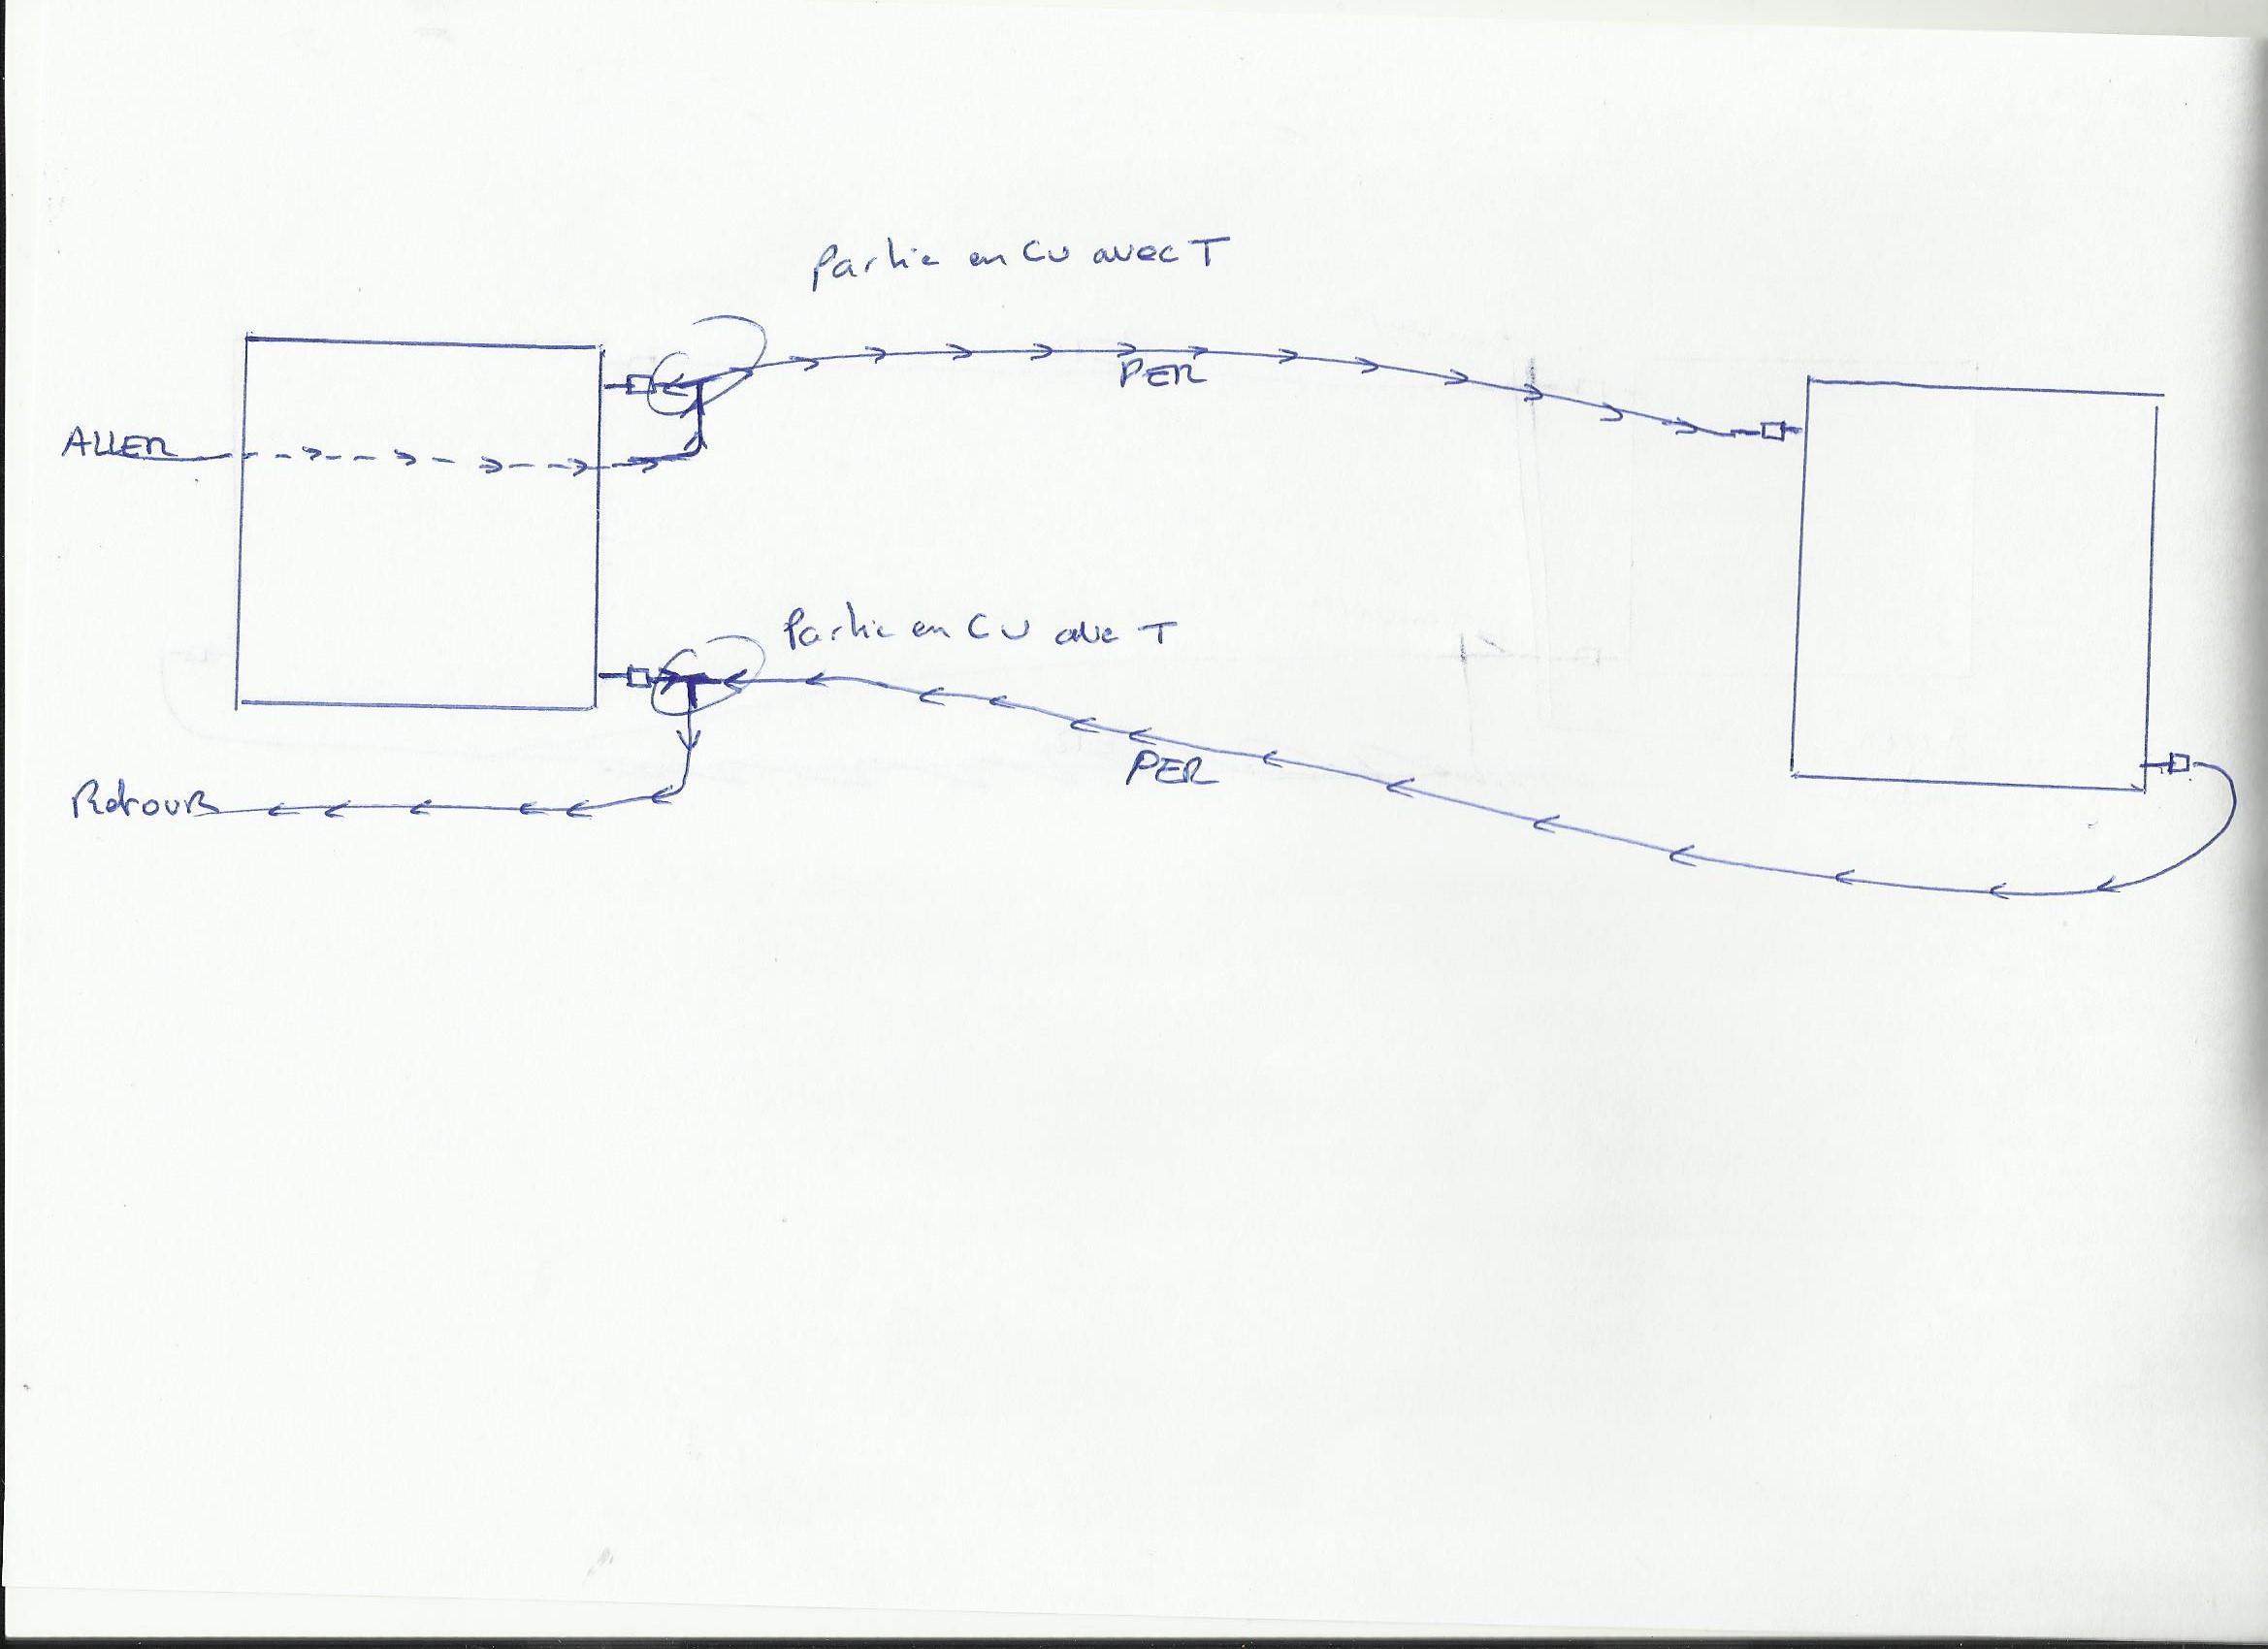 radiateur.jpg, 337.71 kb, 2338 x 1700